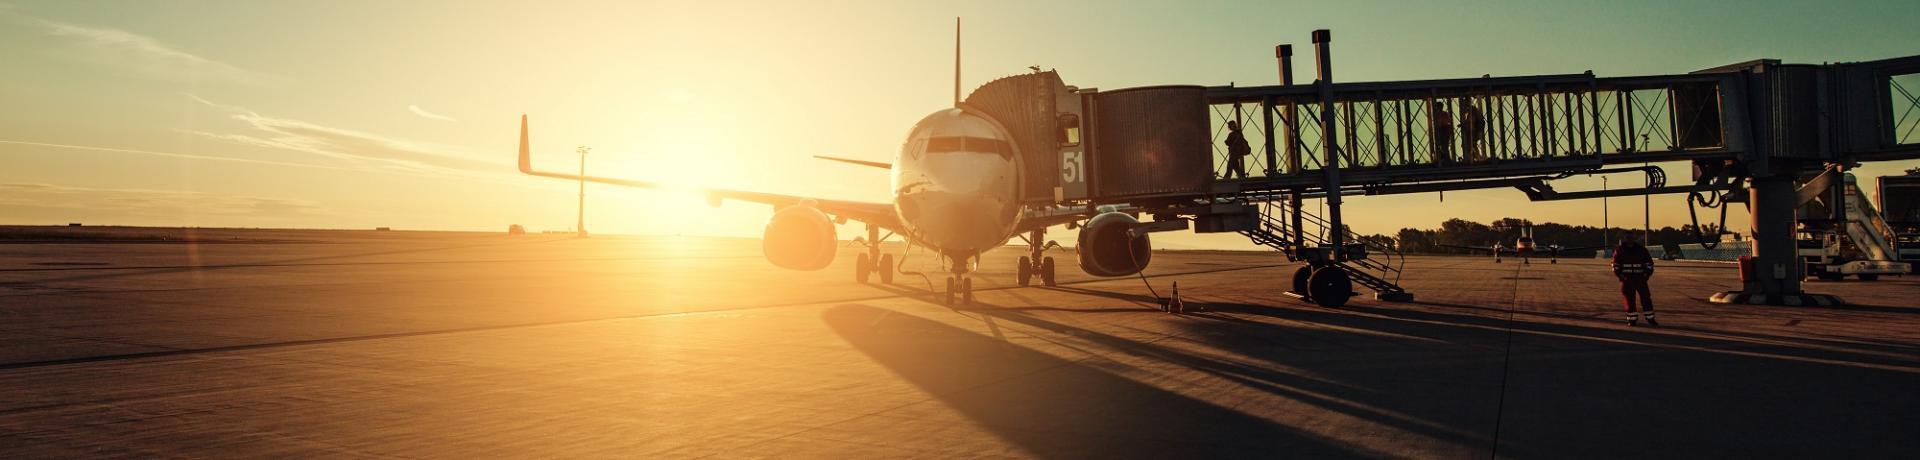 Flugzeug Airport Sonnenuntergang Emotion